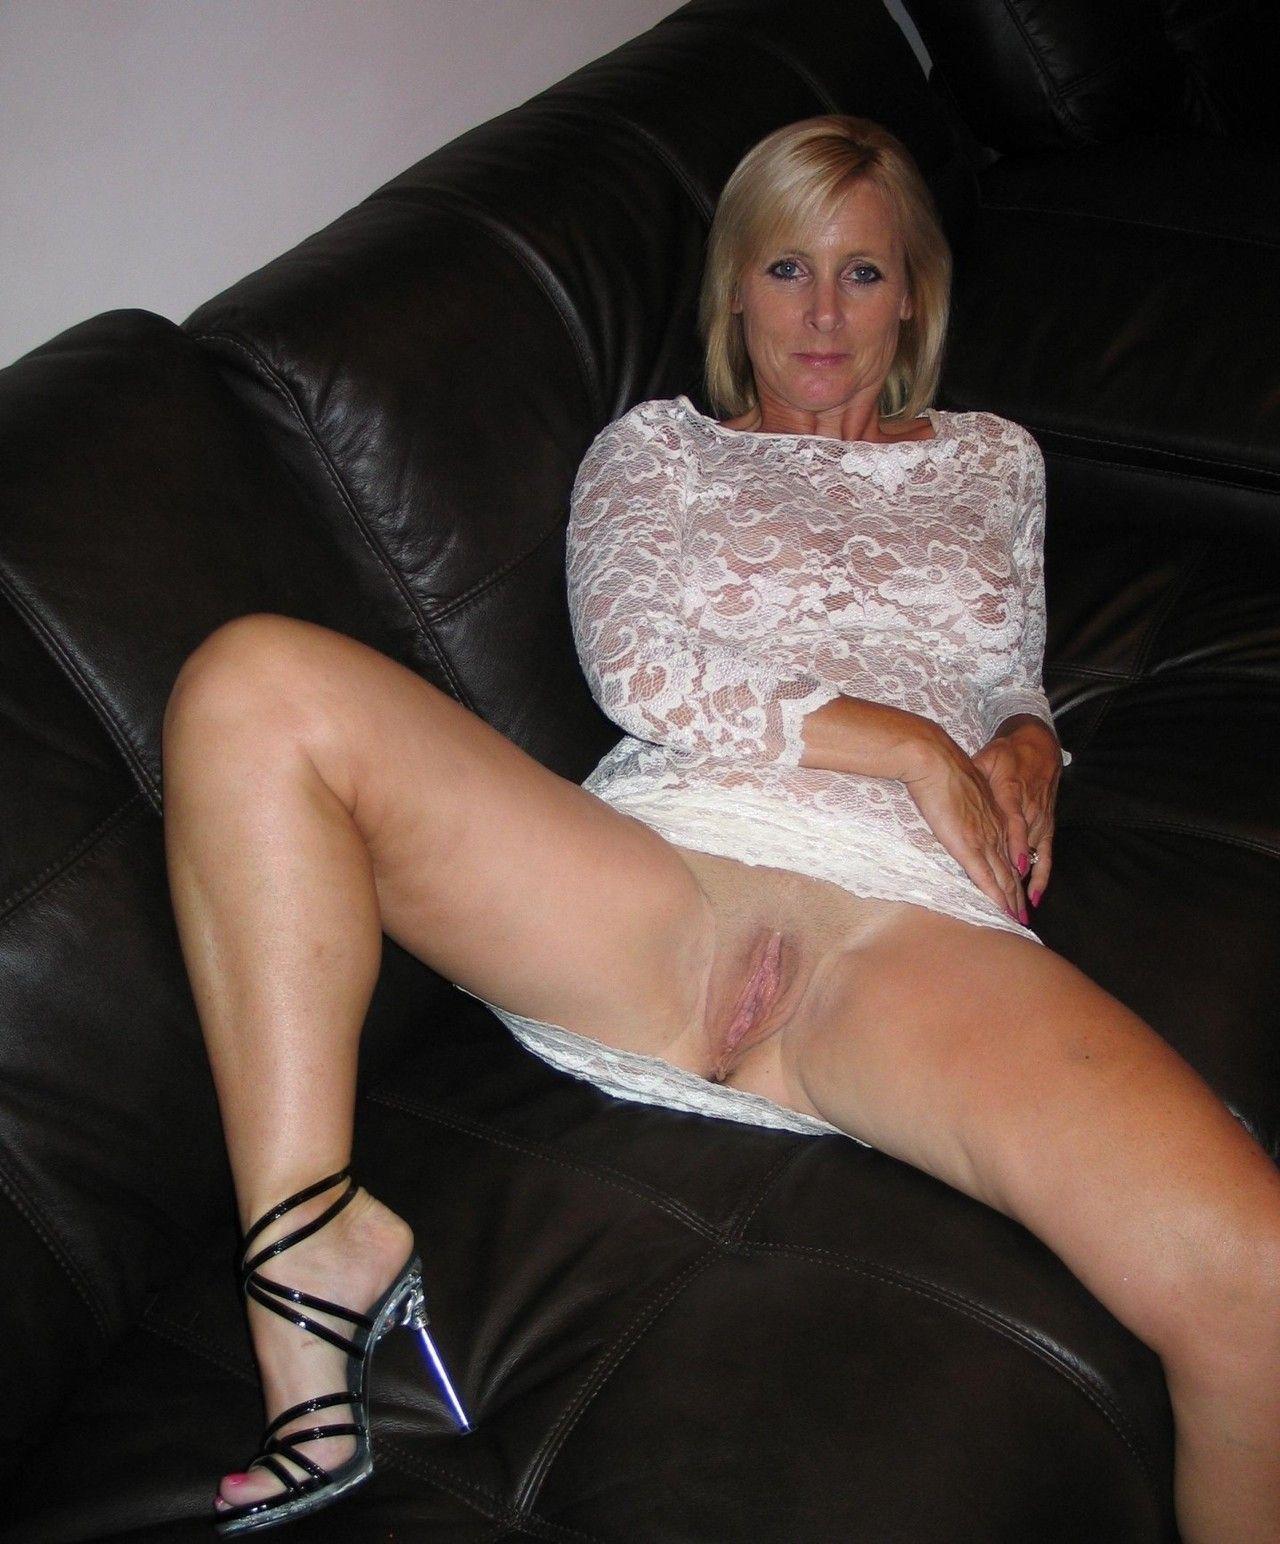 best of Blonde milf pussy Nude